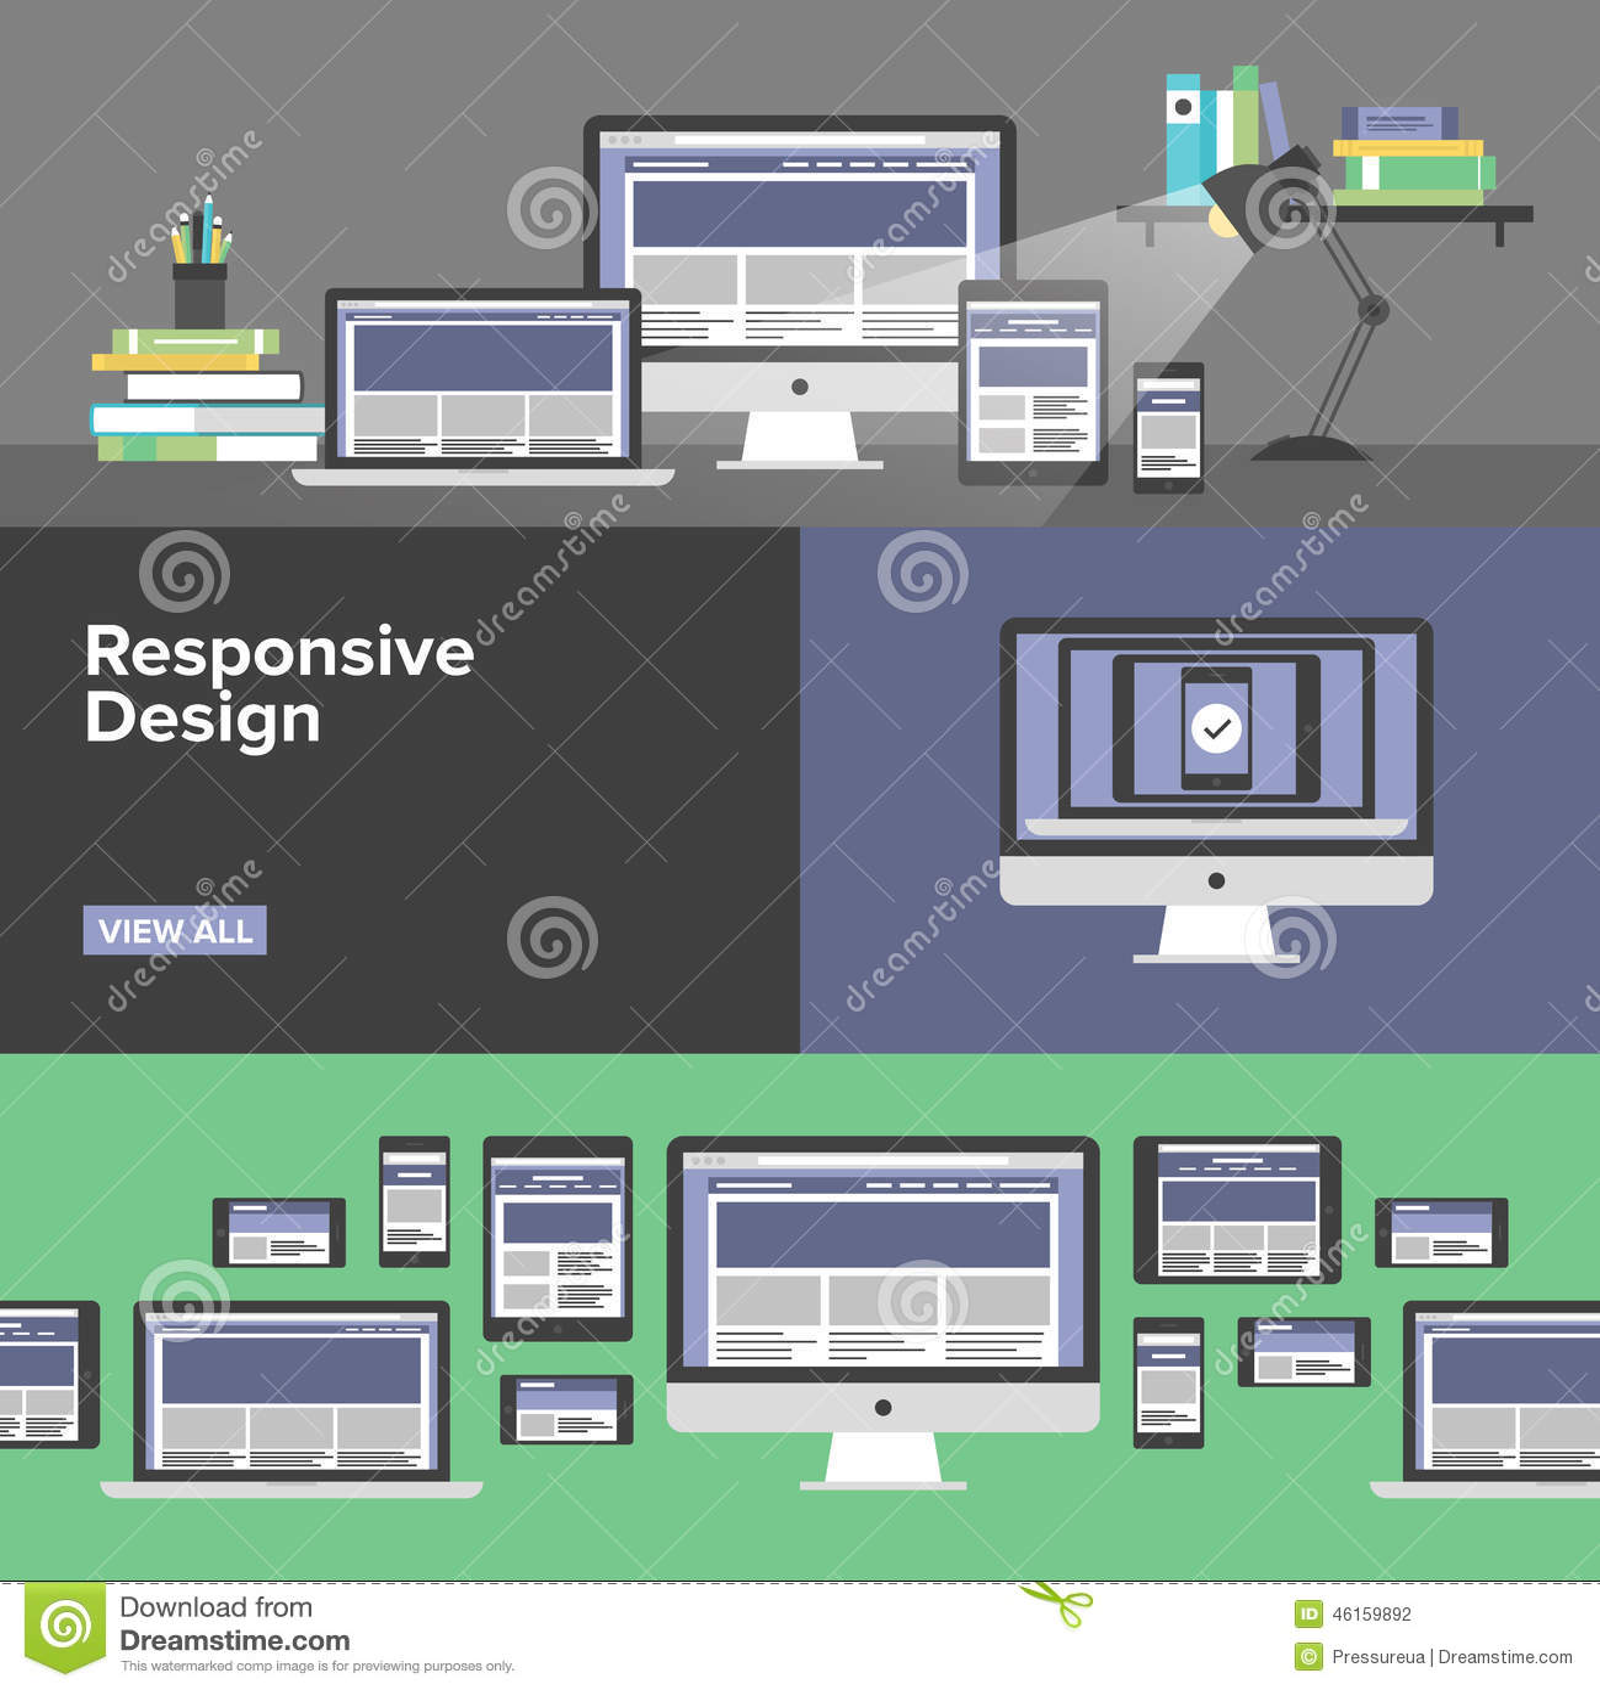 Responsive web design flat banners